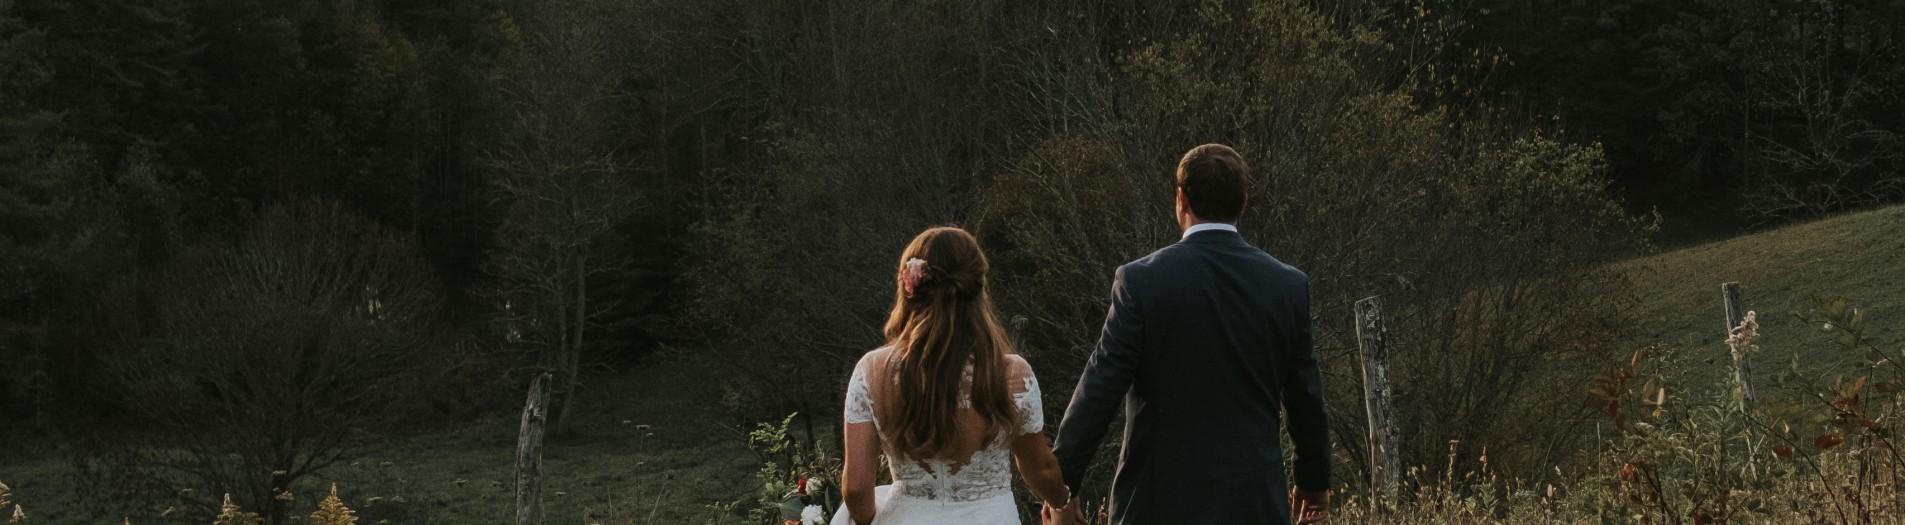 Sarah + Ryan | Fines Creek Farm Wedding in Asheville, NC